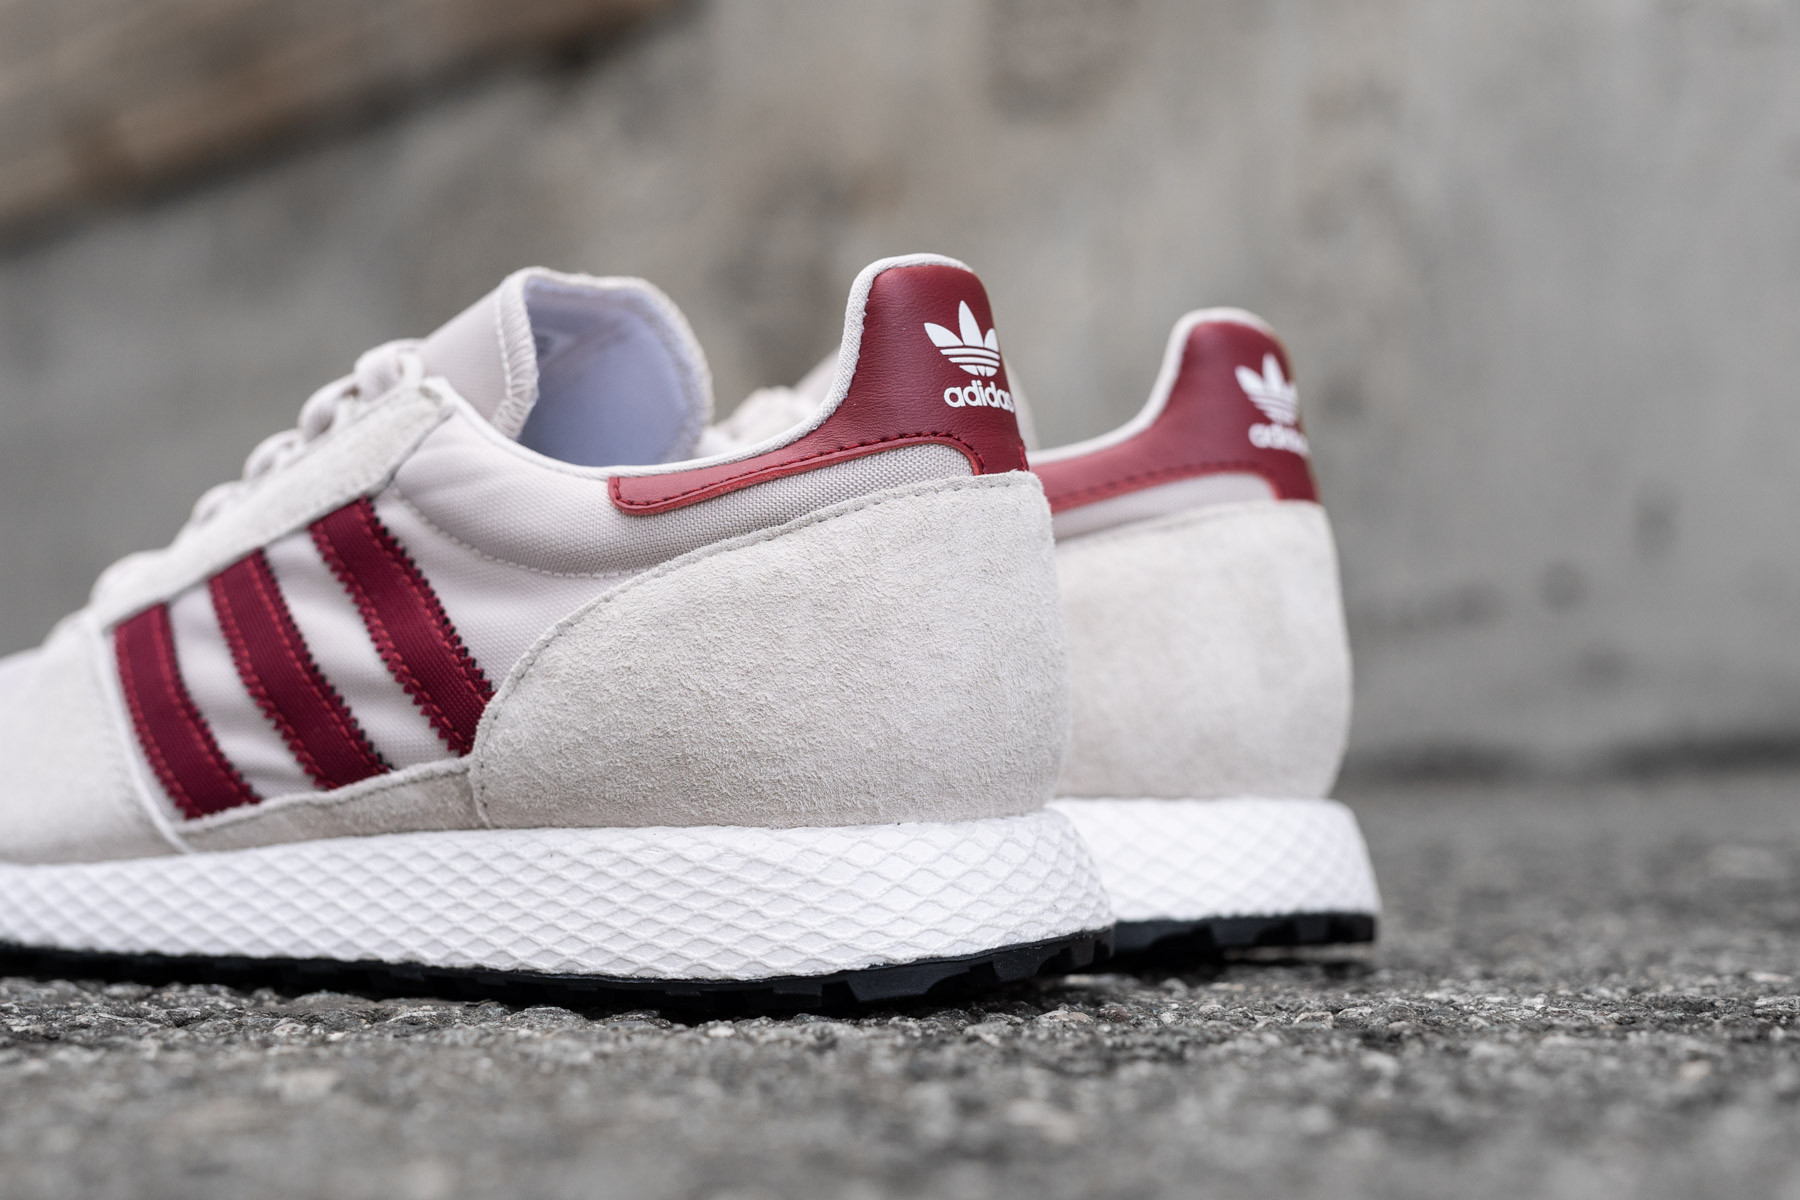 premium selection 0ea6a e0351 W Adidas Forest Grove